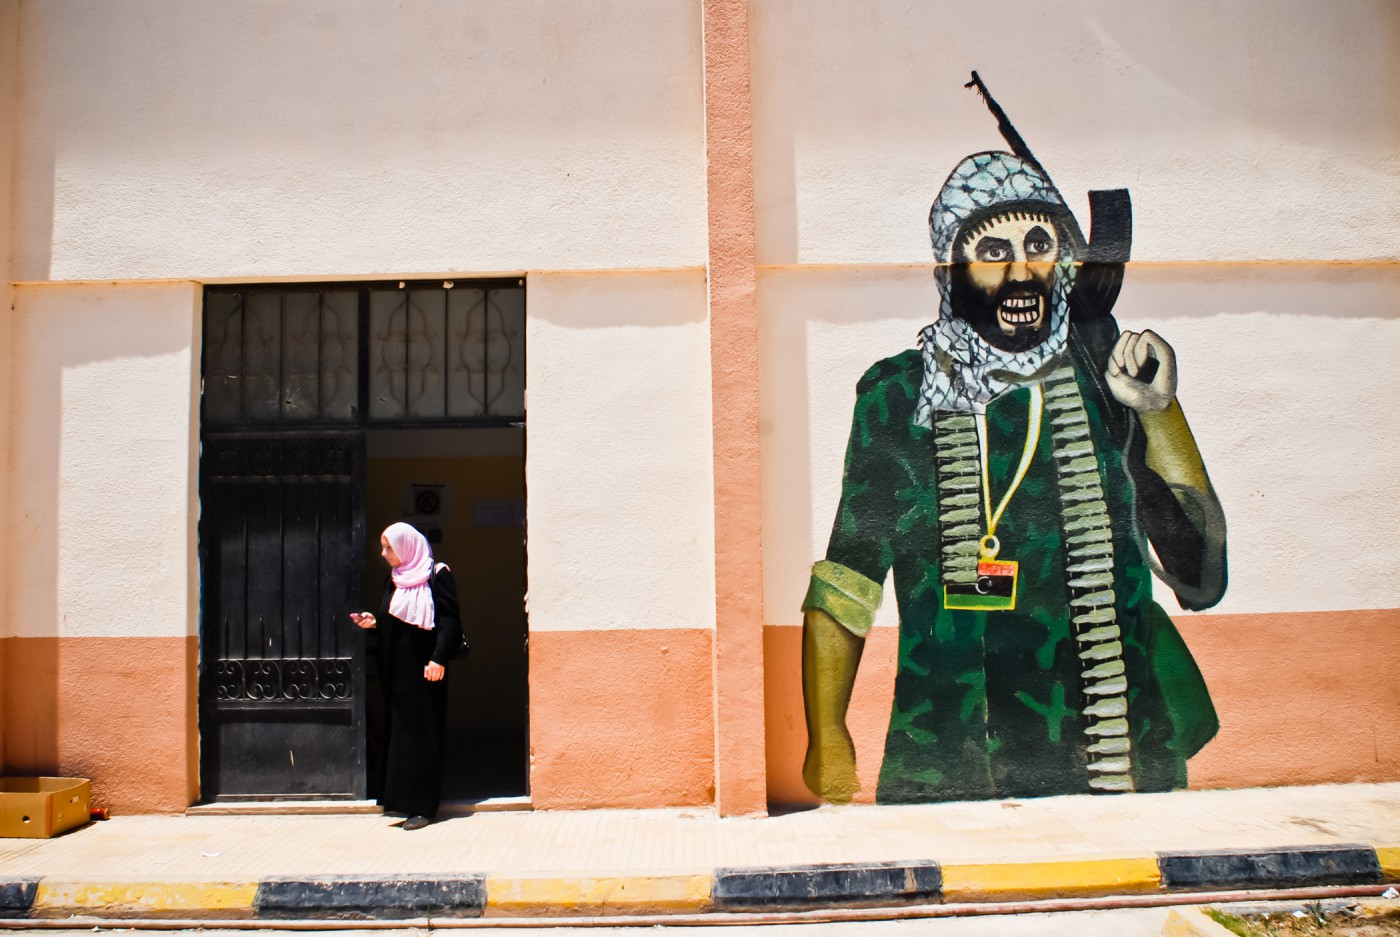 Samer Muscati, </span><span><em>Casting her ballot</em>, </span><span>2012